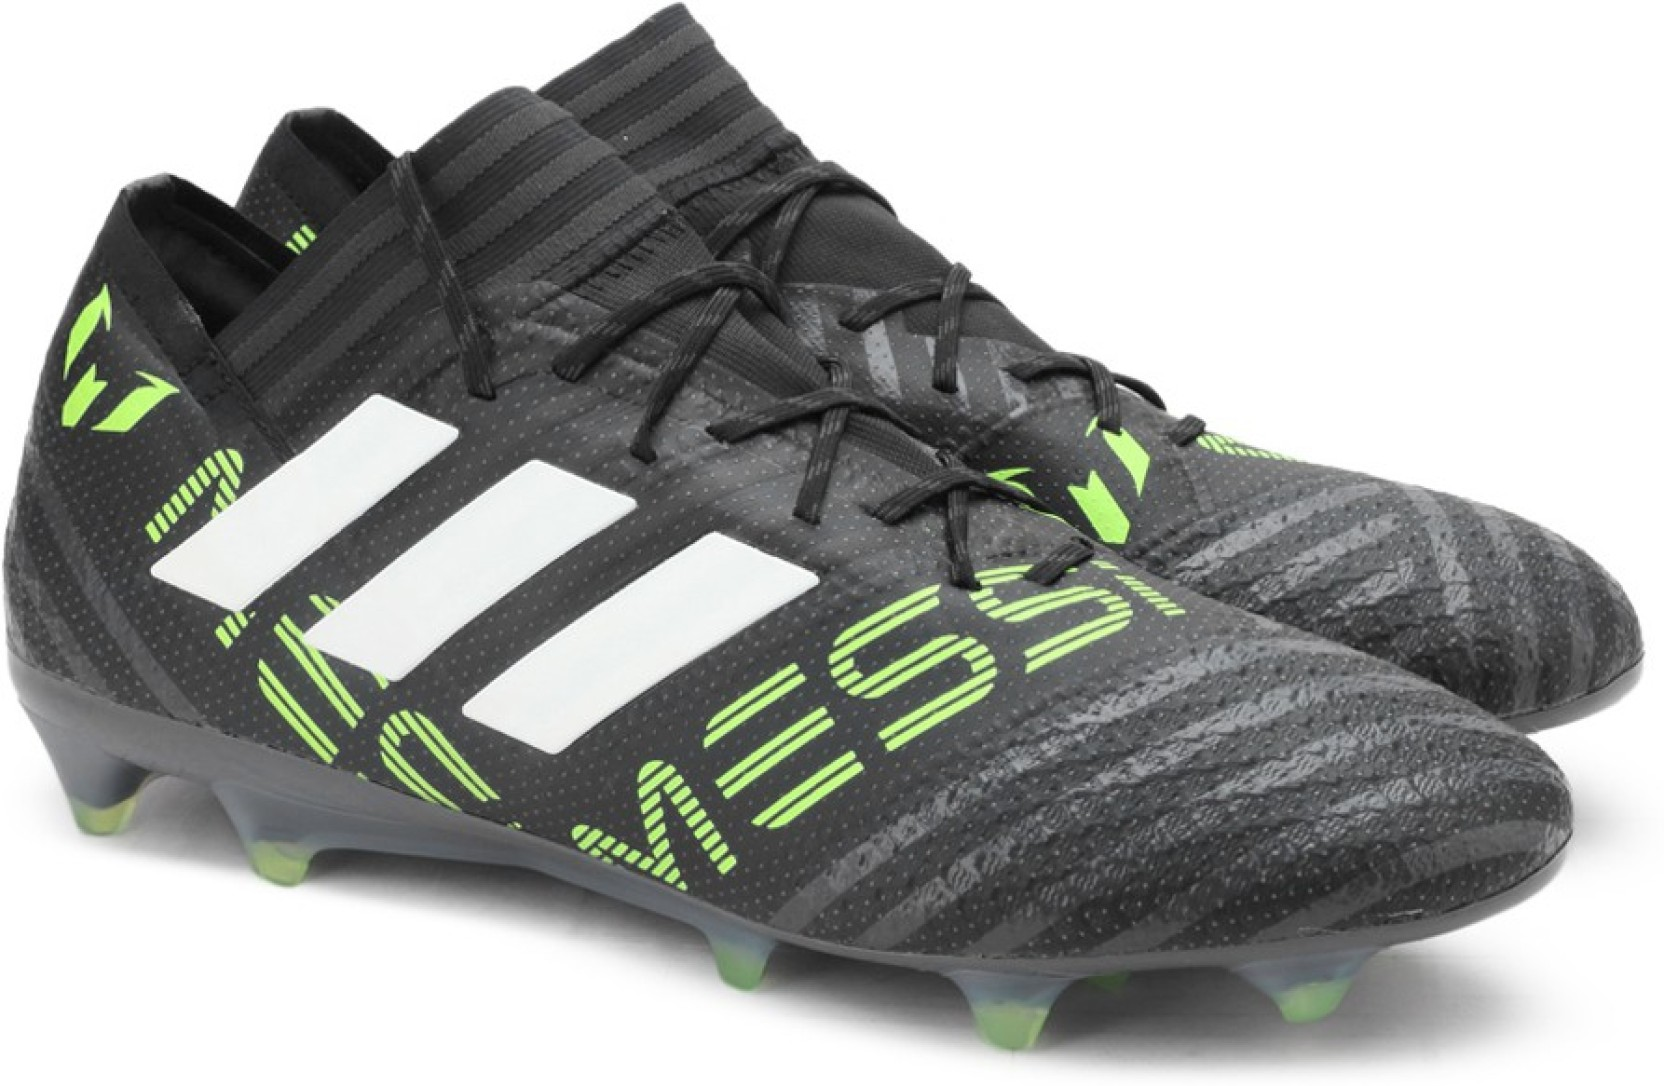 278de0c78 ADIDAS NEMEZIZ MESSI 17.1 FG Football Shoes For Men - Buy CBLACK ...